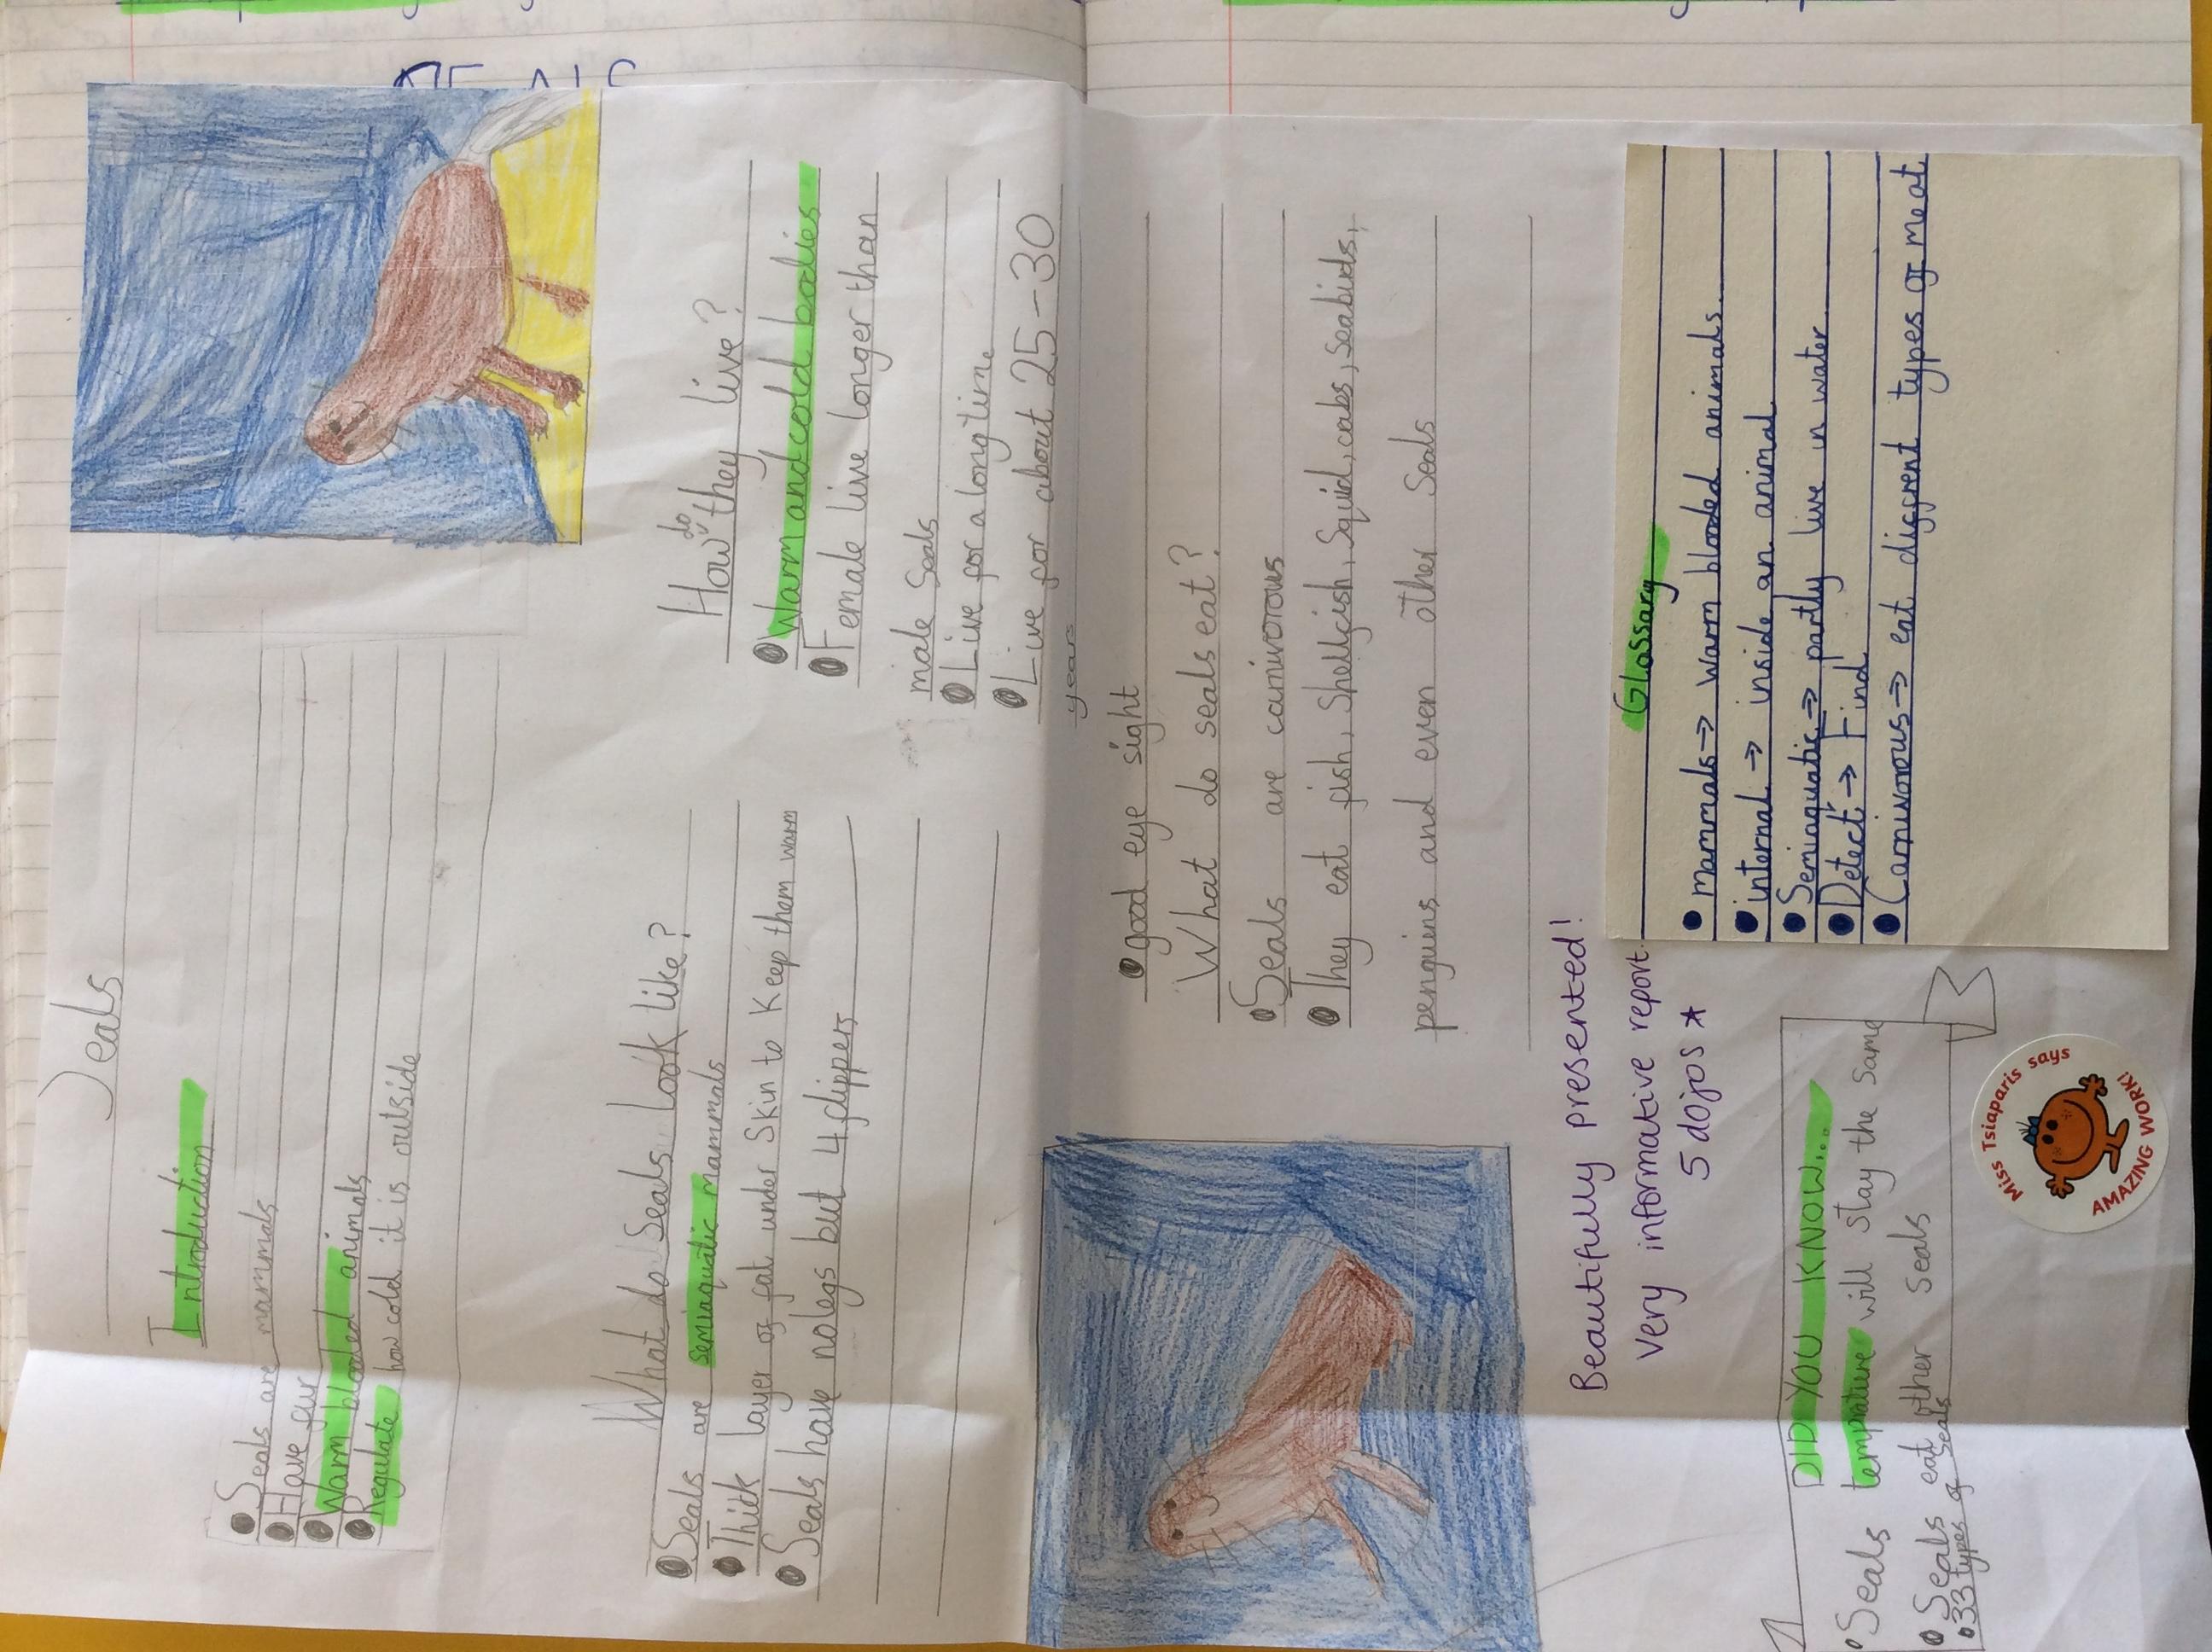 Kanon's fantastic report!